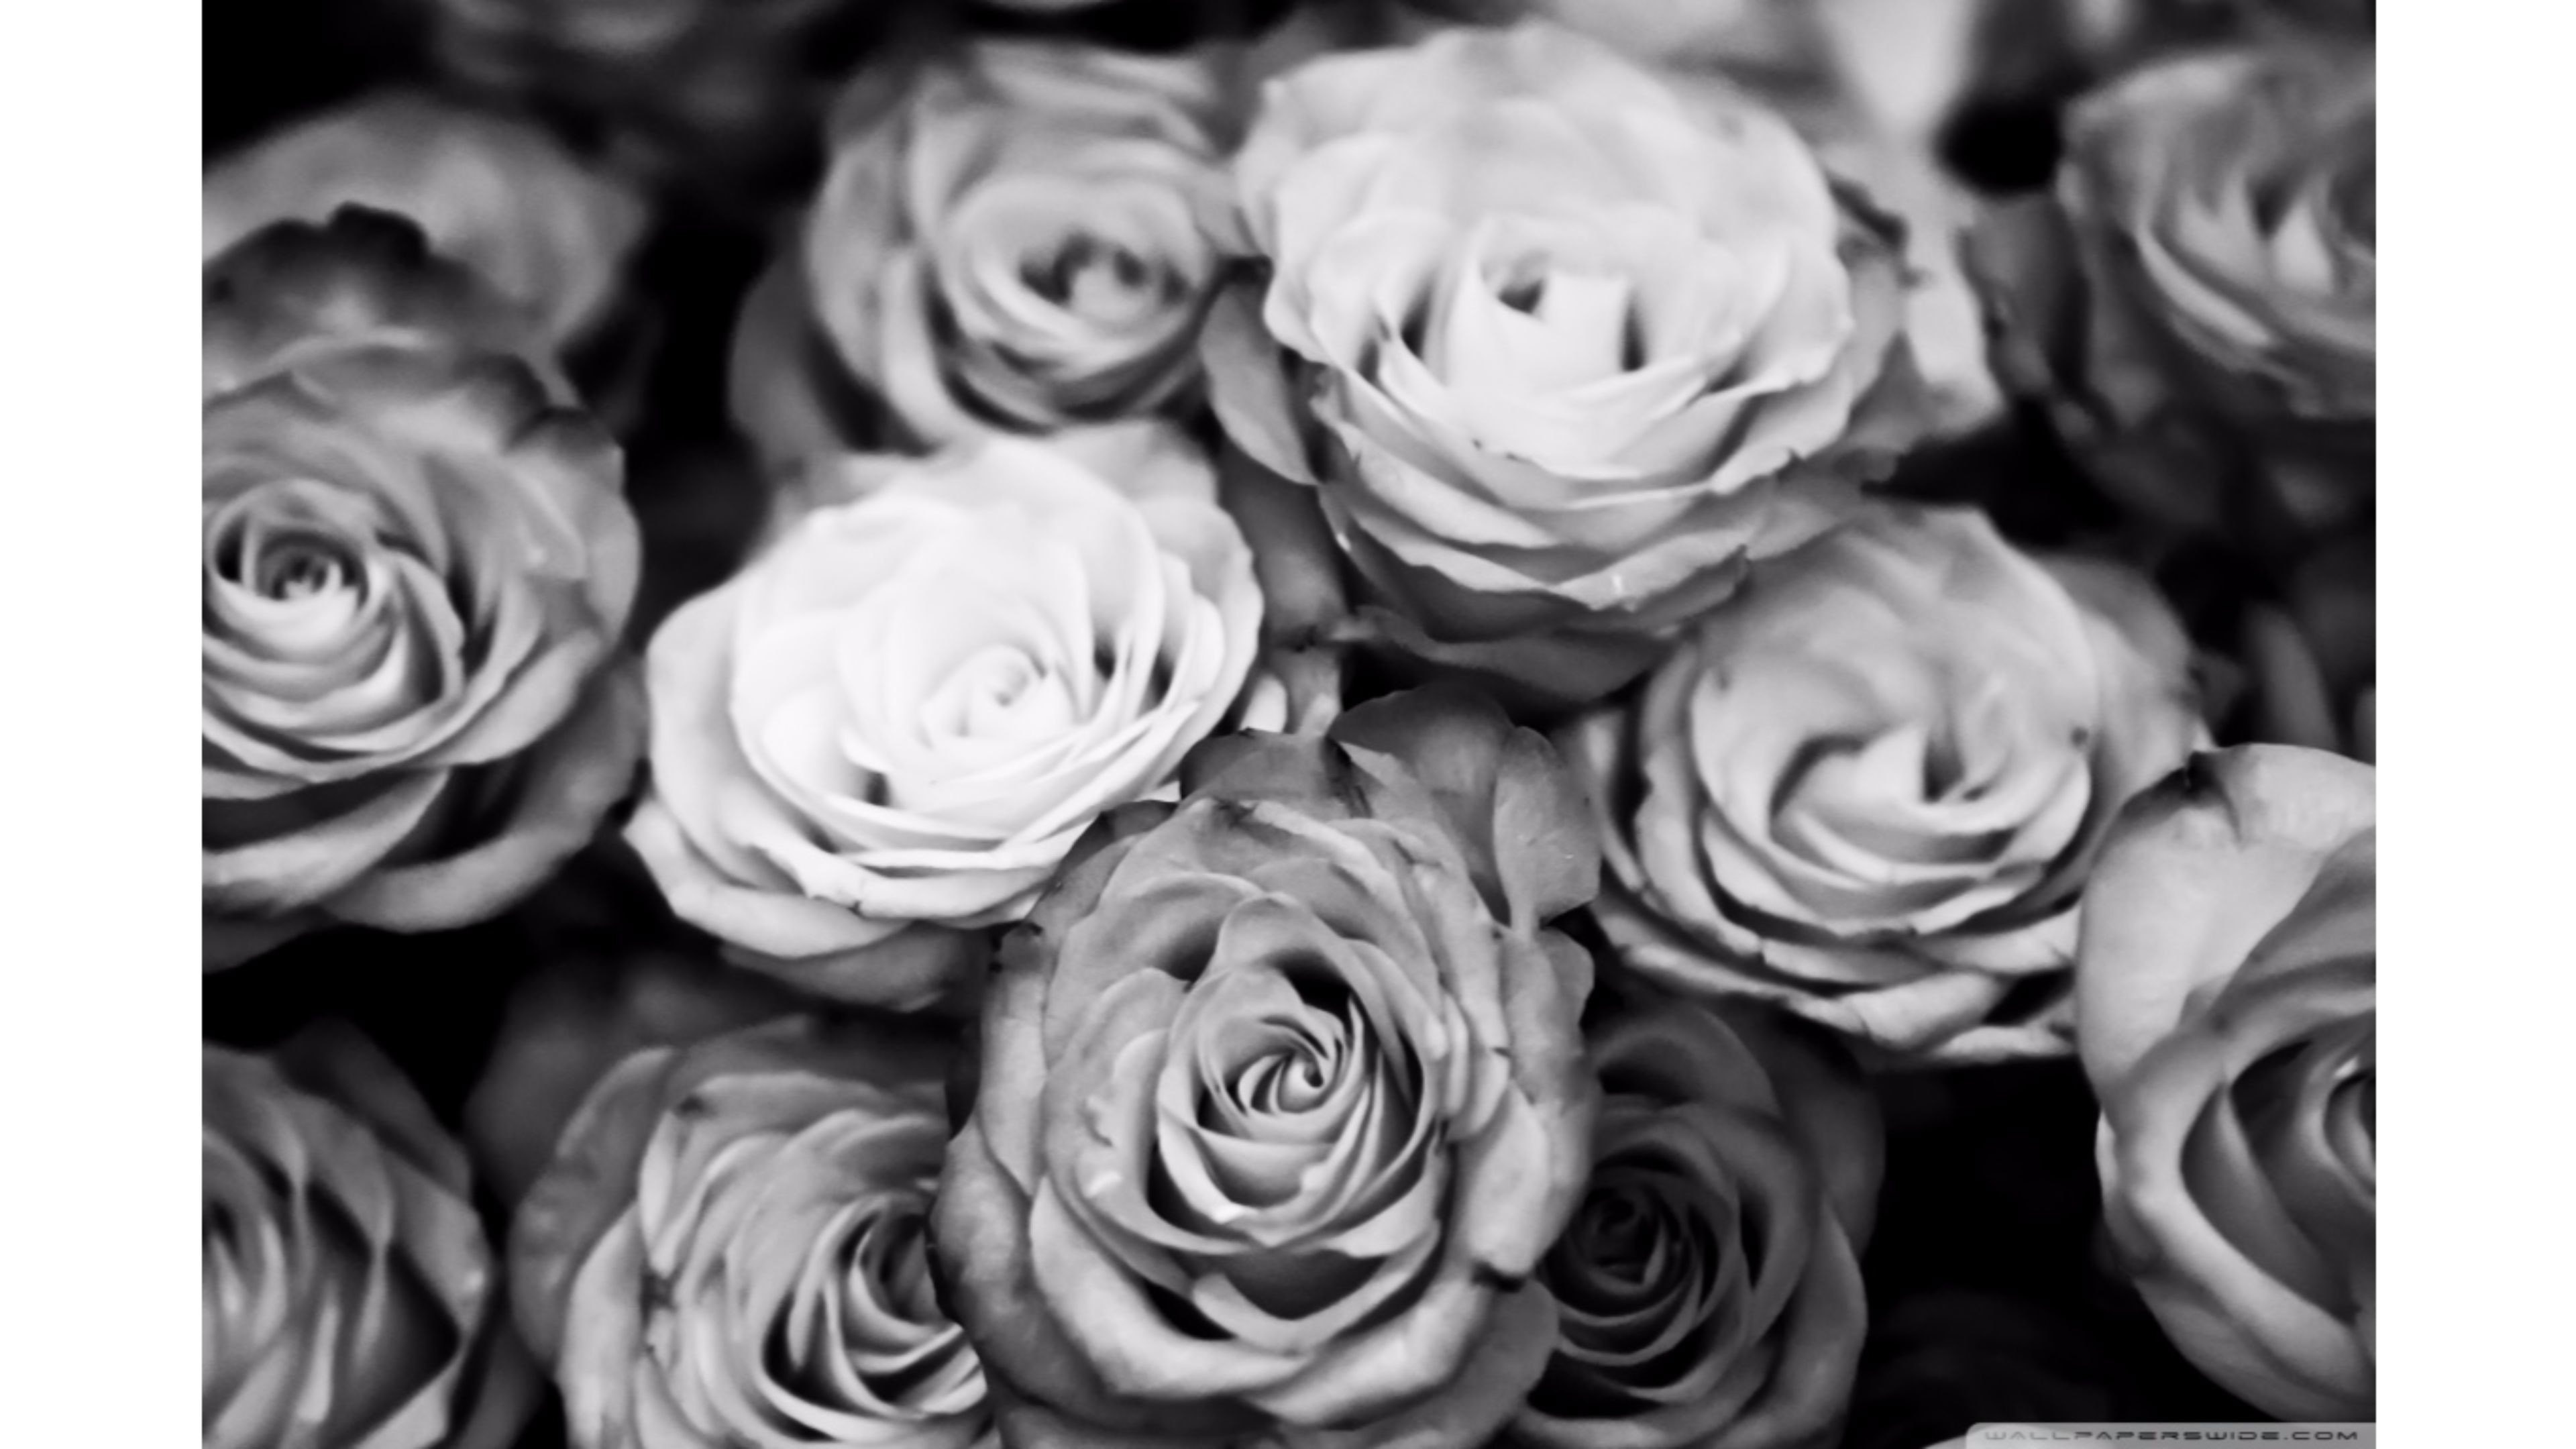 Black Rose Wallpapers – Full HD wallpaper search